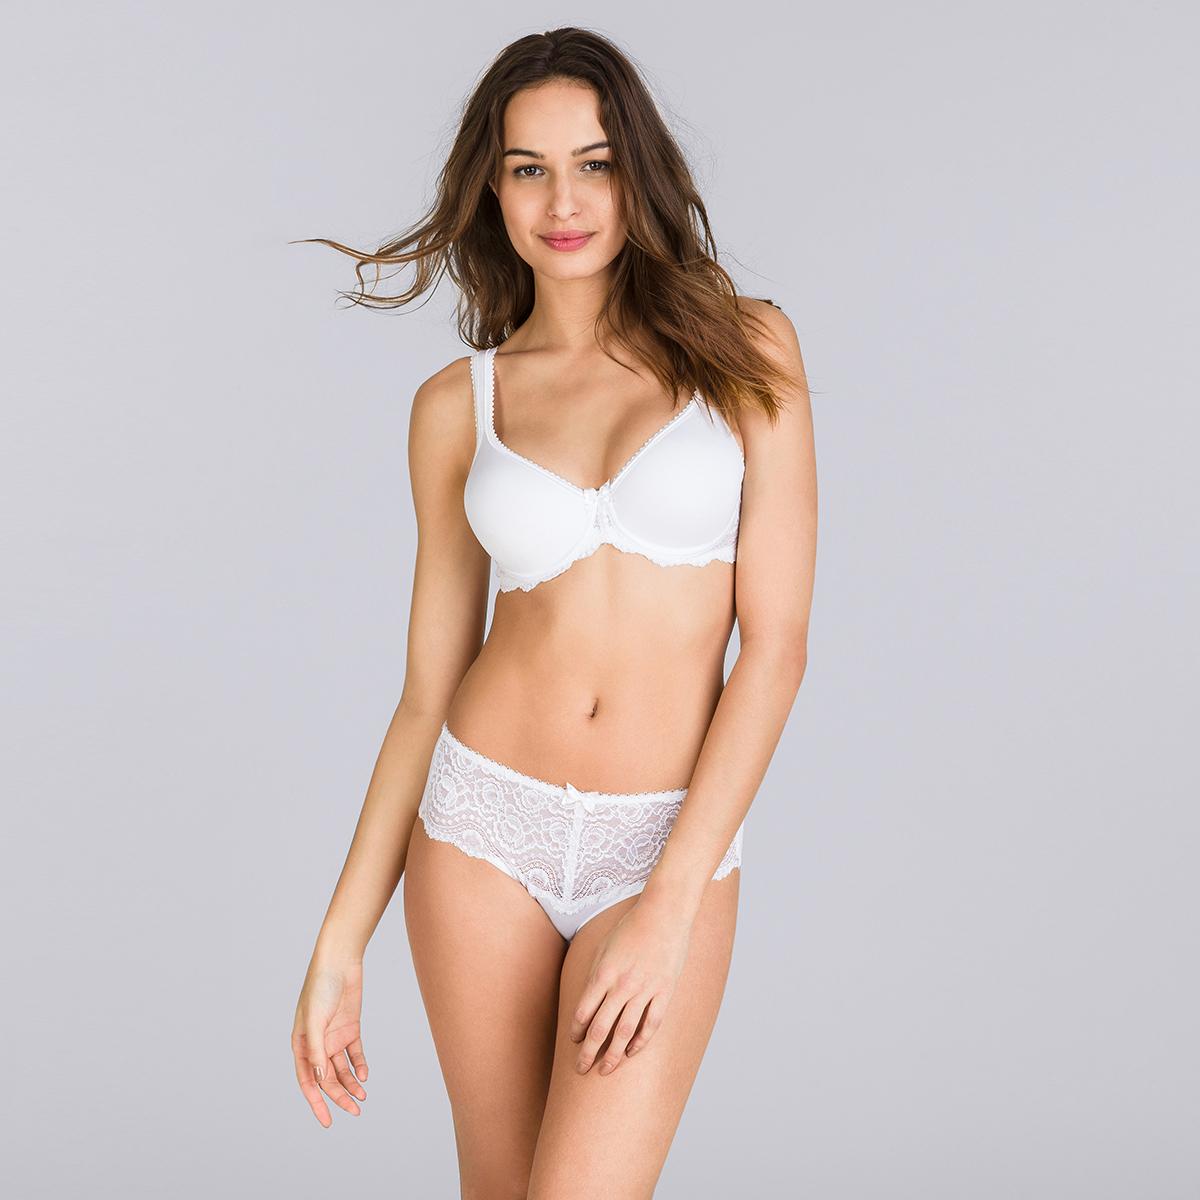 Spacer Bra in White – Flower Elegance, , PLAYTEX